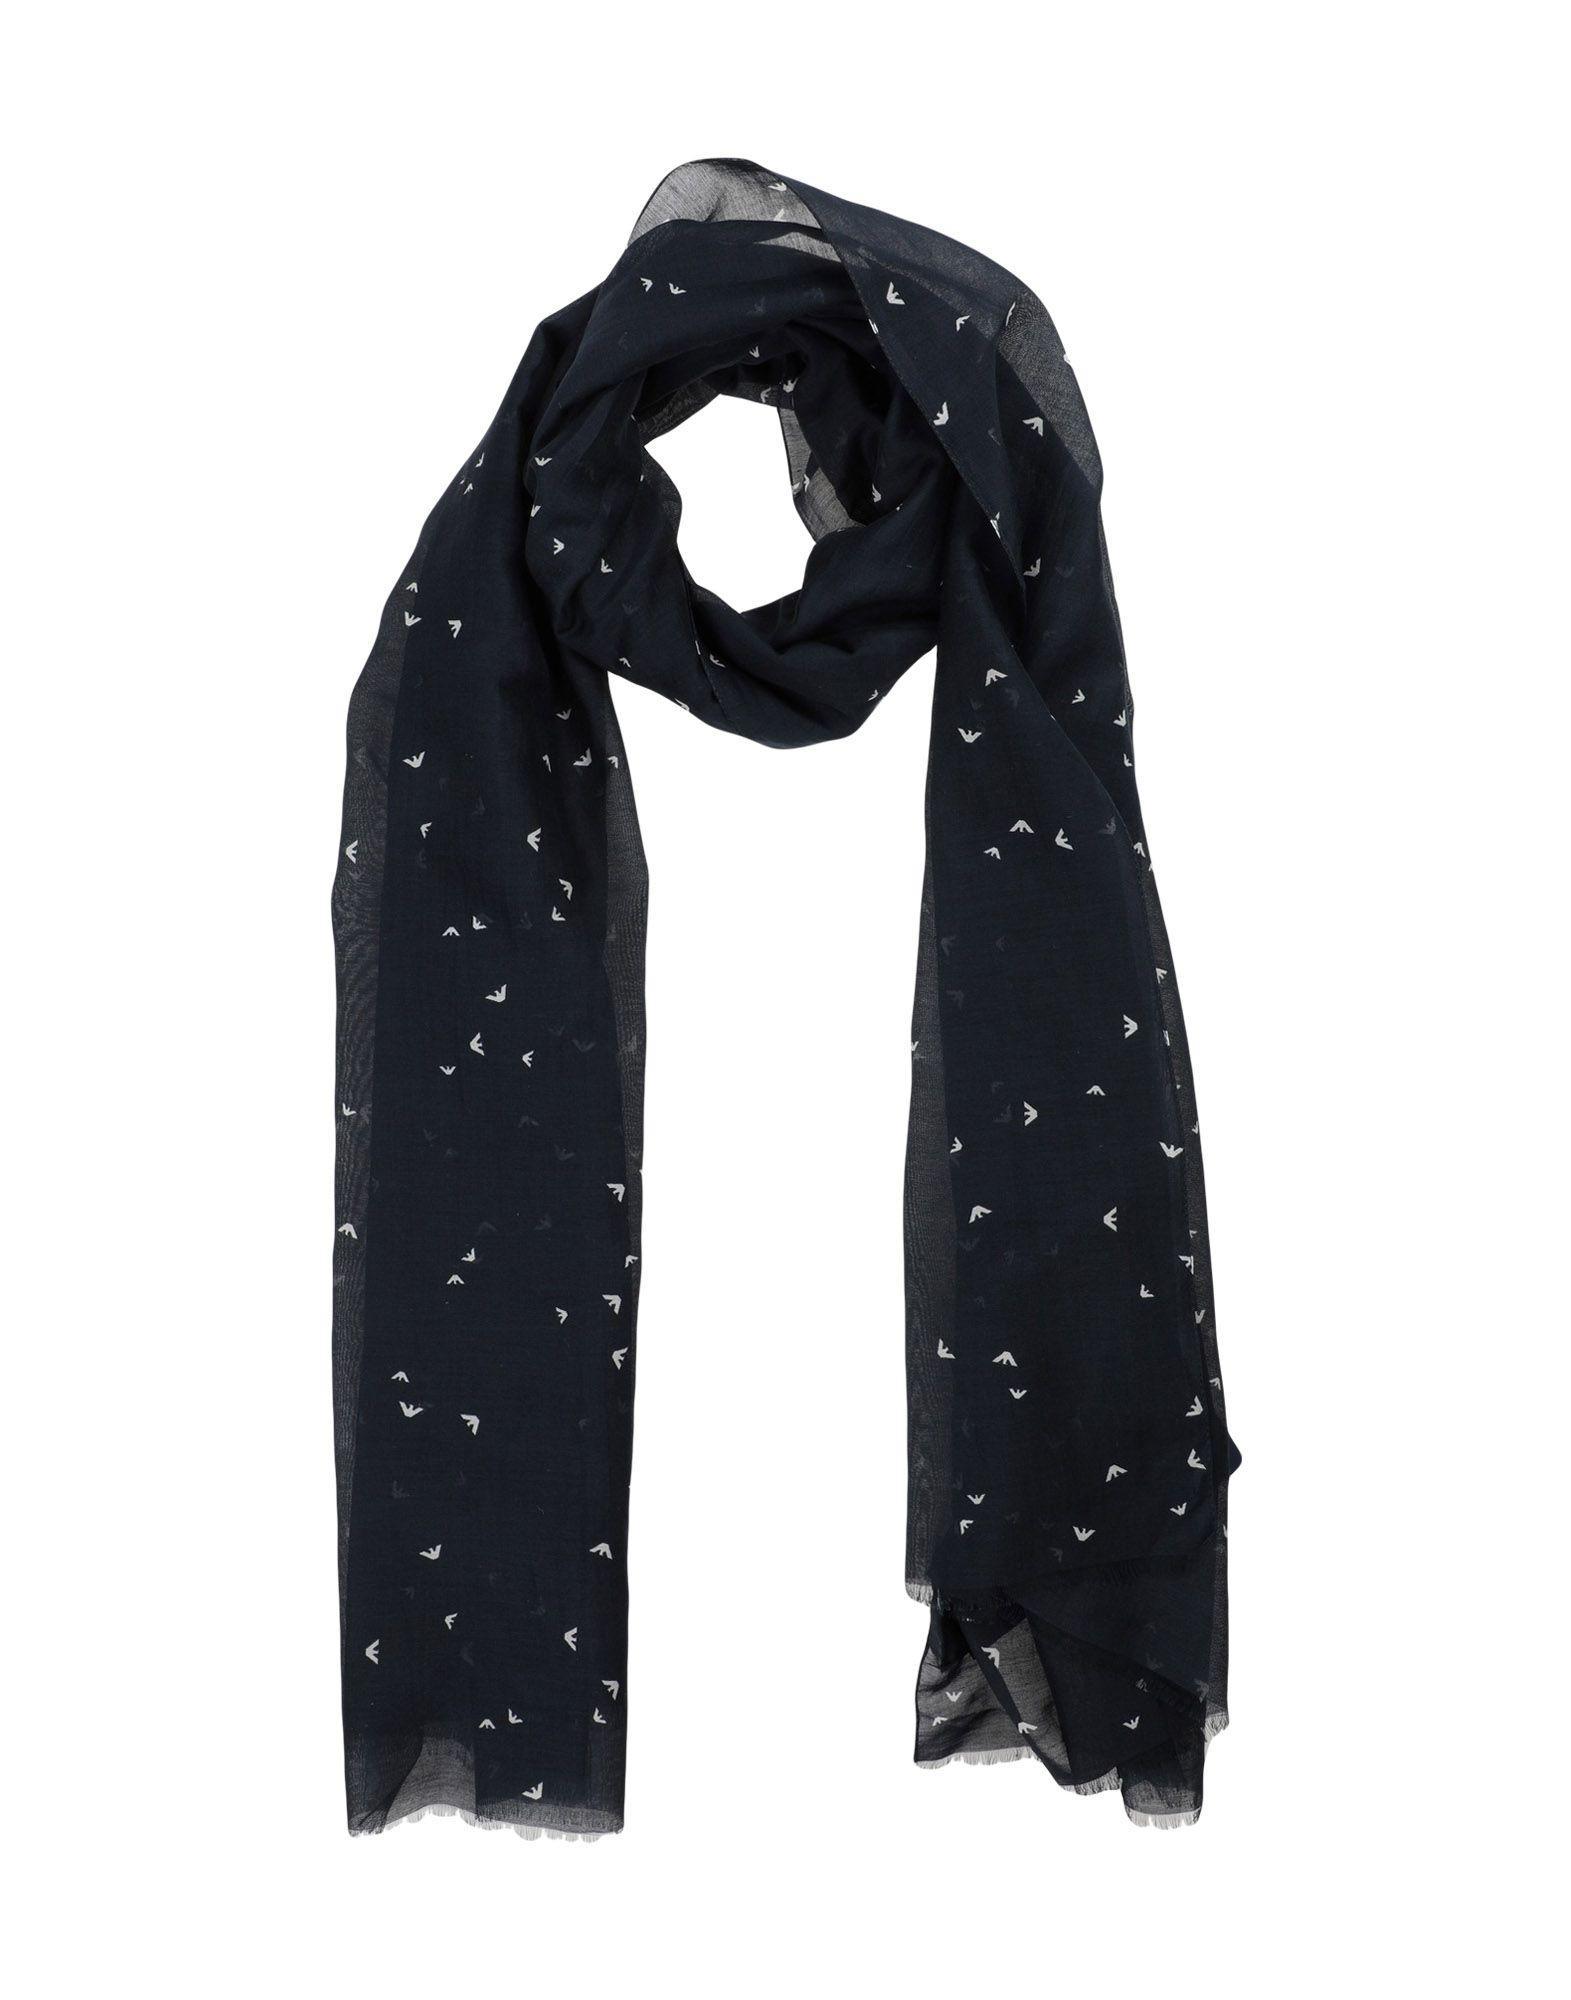 Armani Jeans Oblong Scarves In Dark Blue